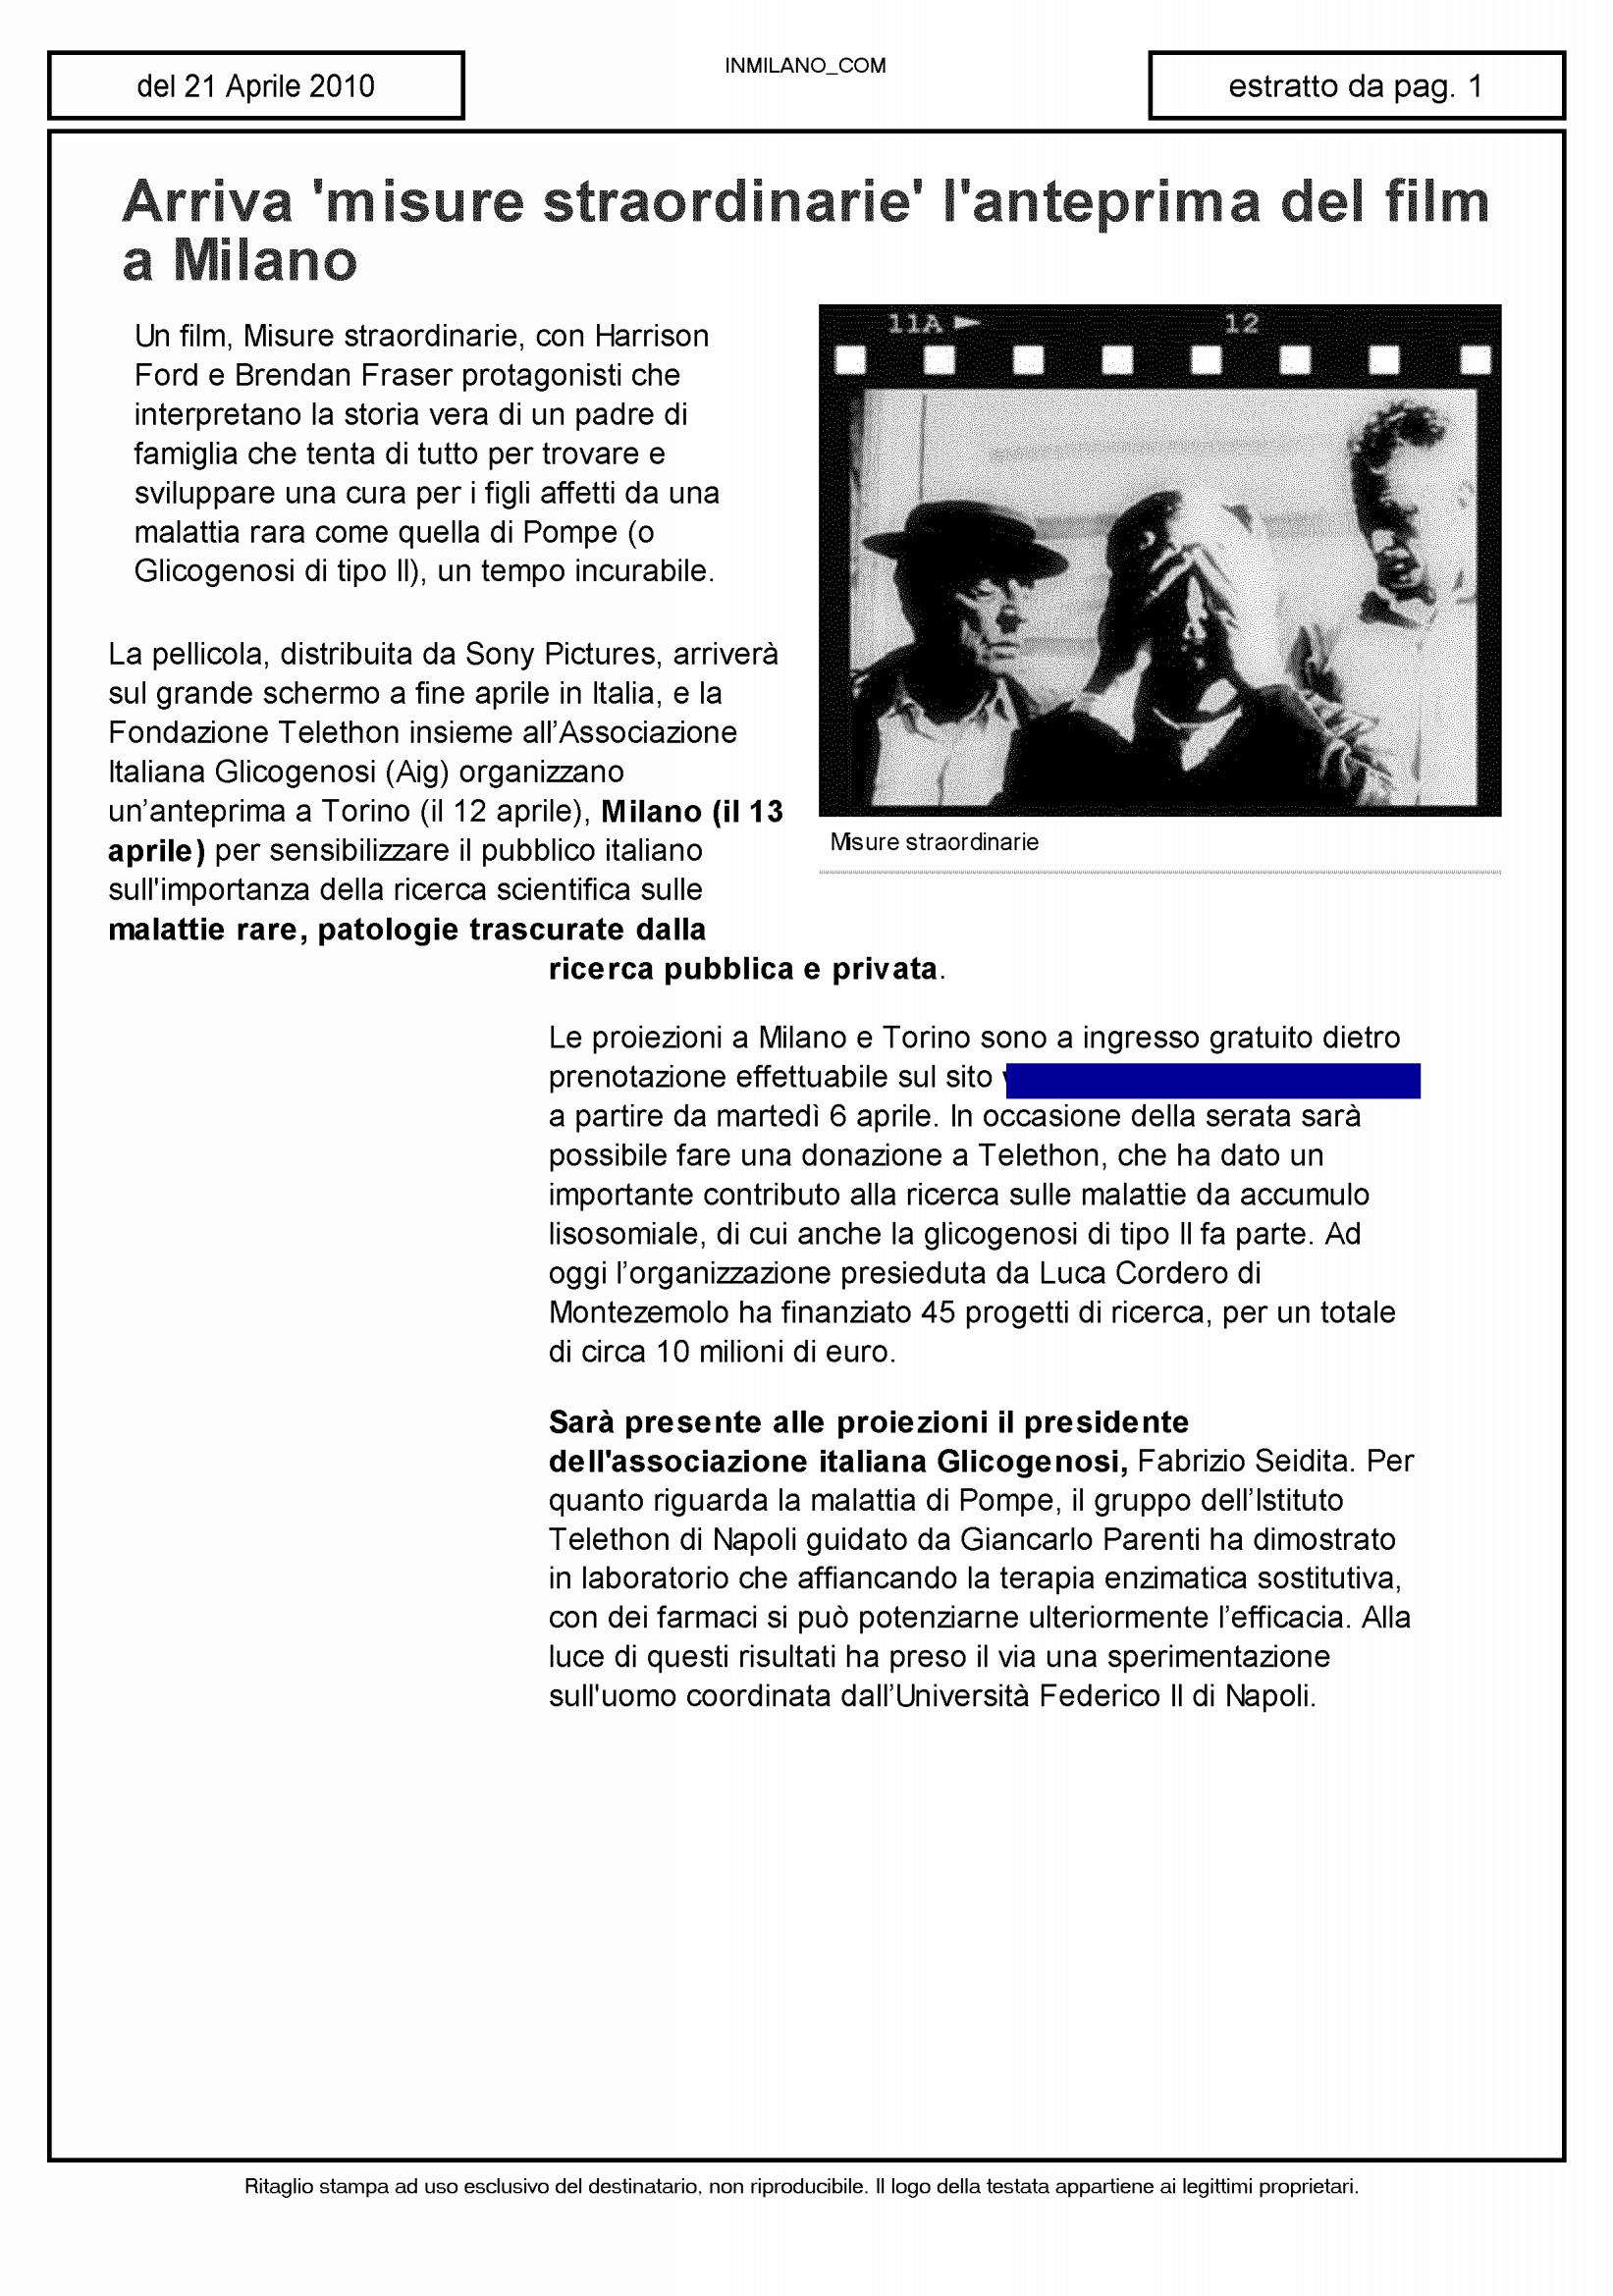 Stampa_20100422_misure straordinarie_Page_48